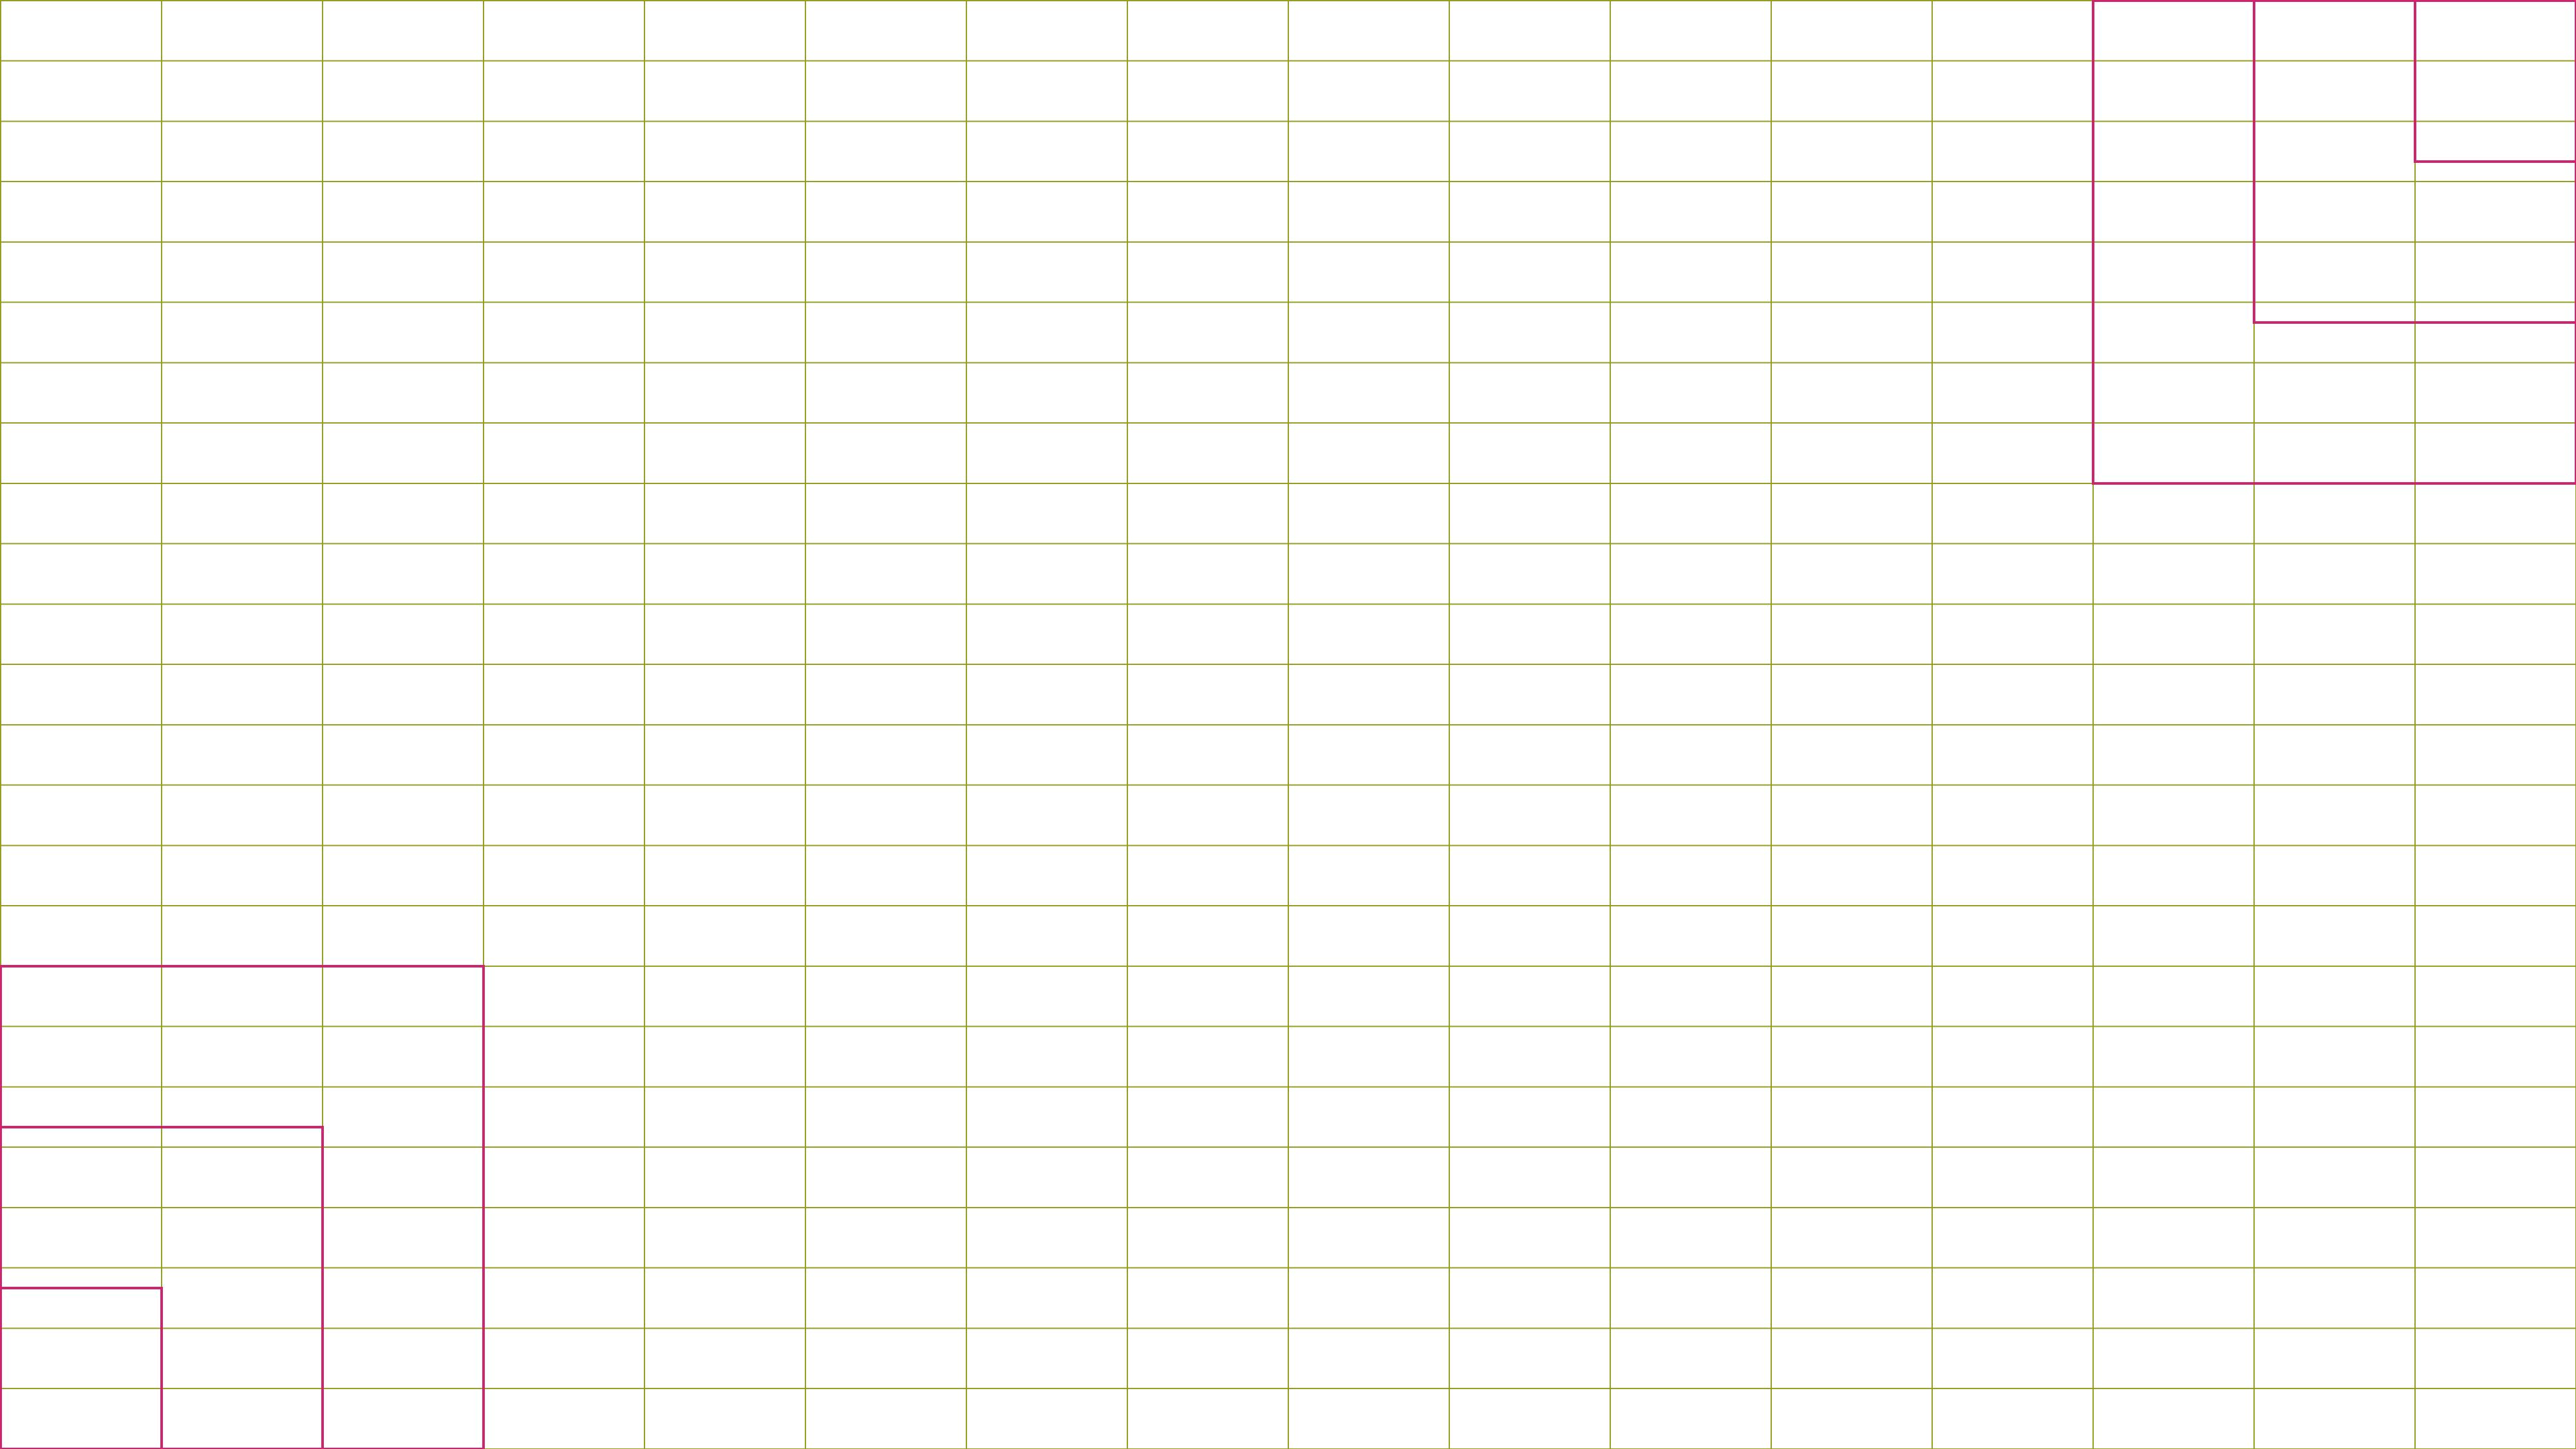 gridsystemet-95-95